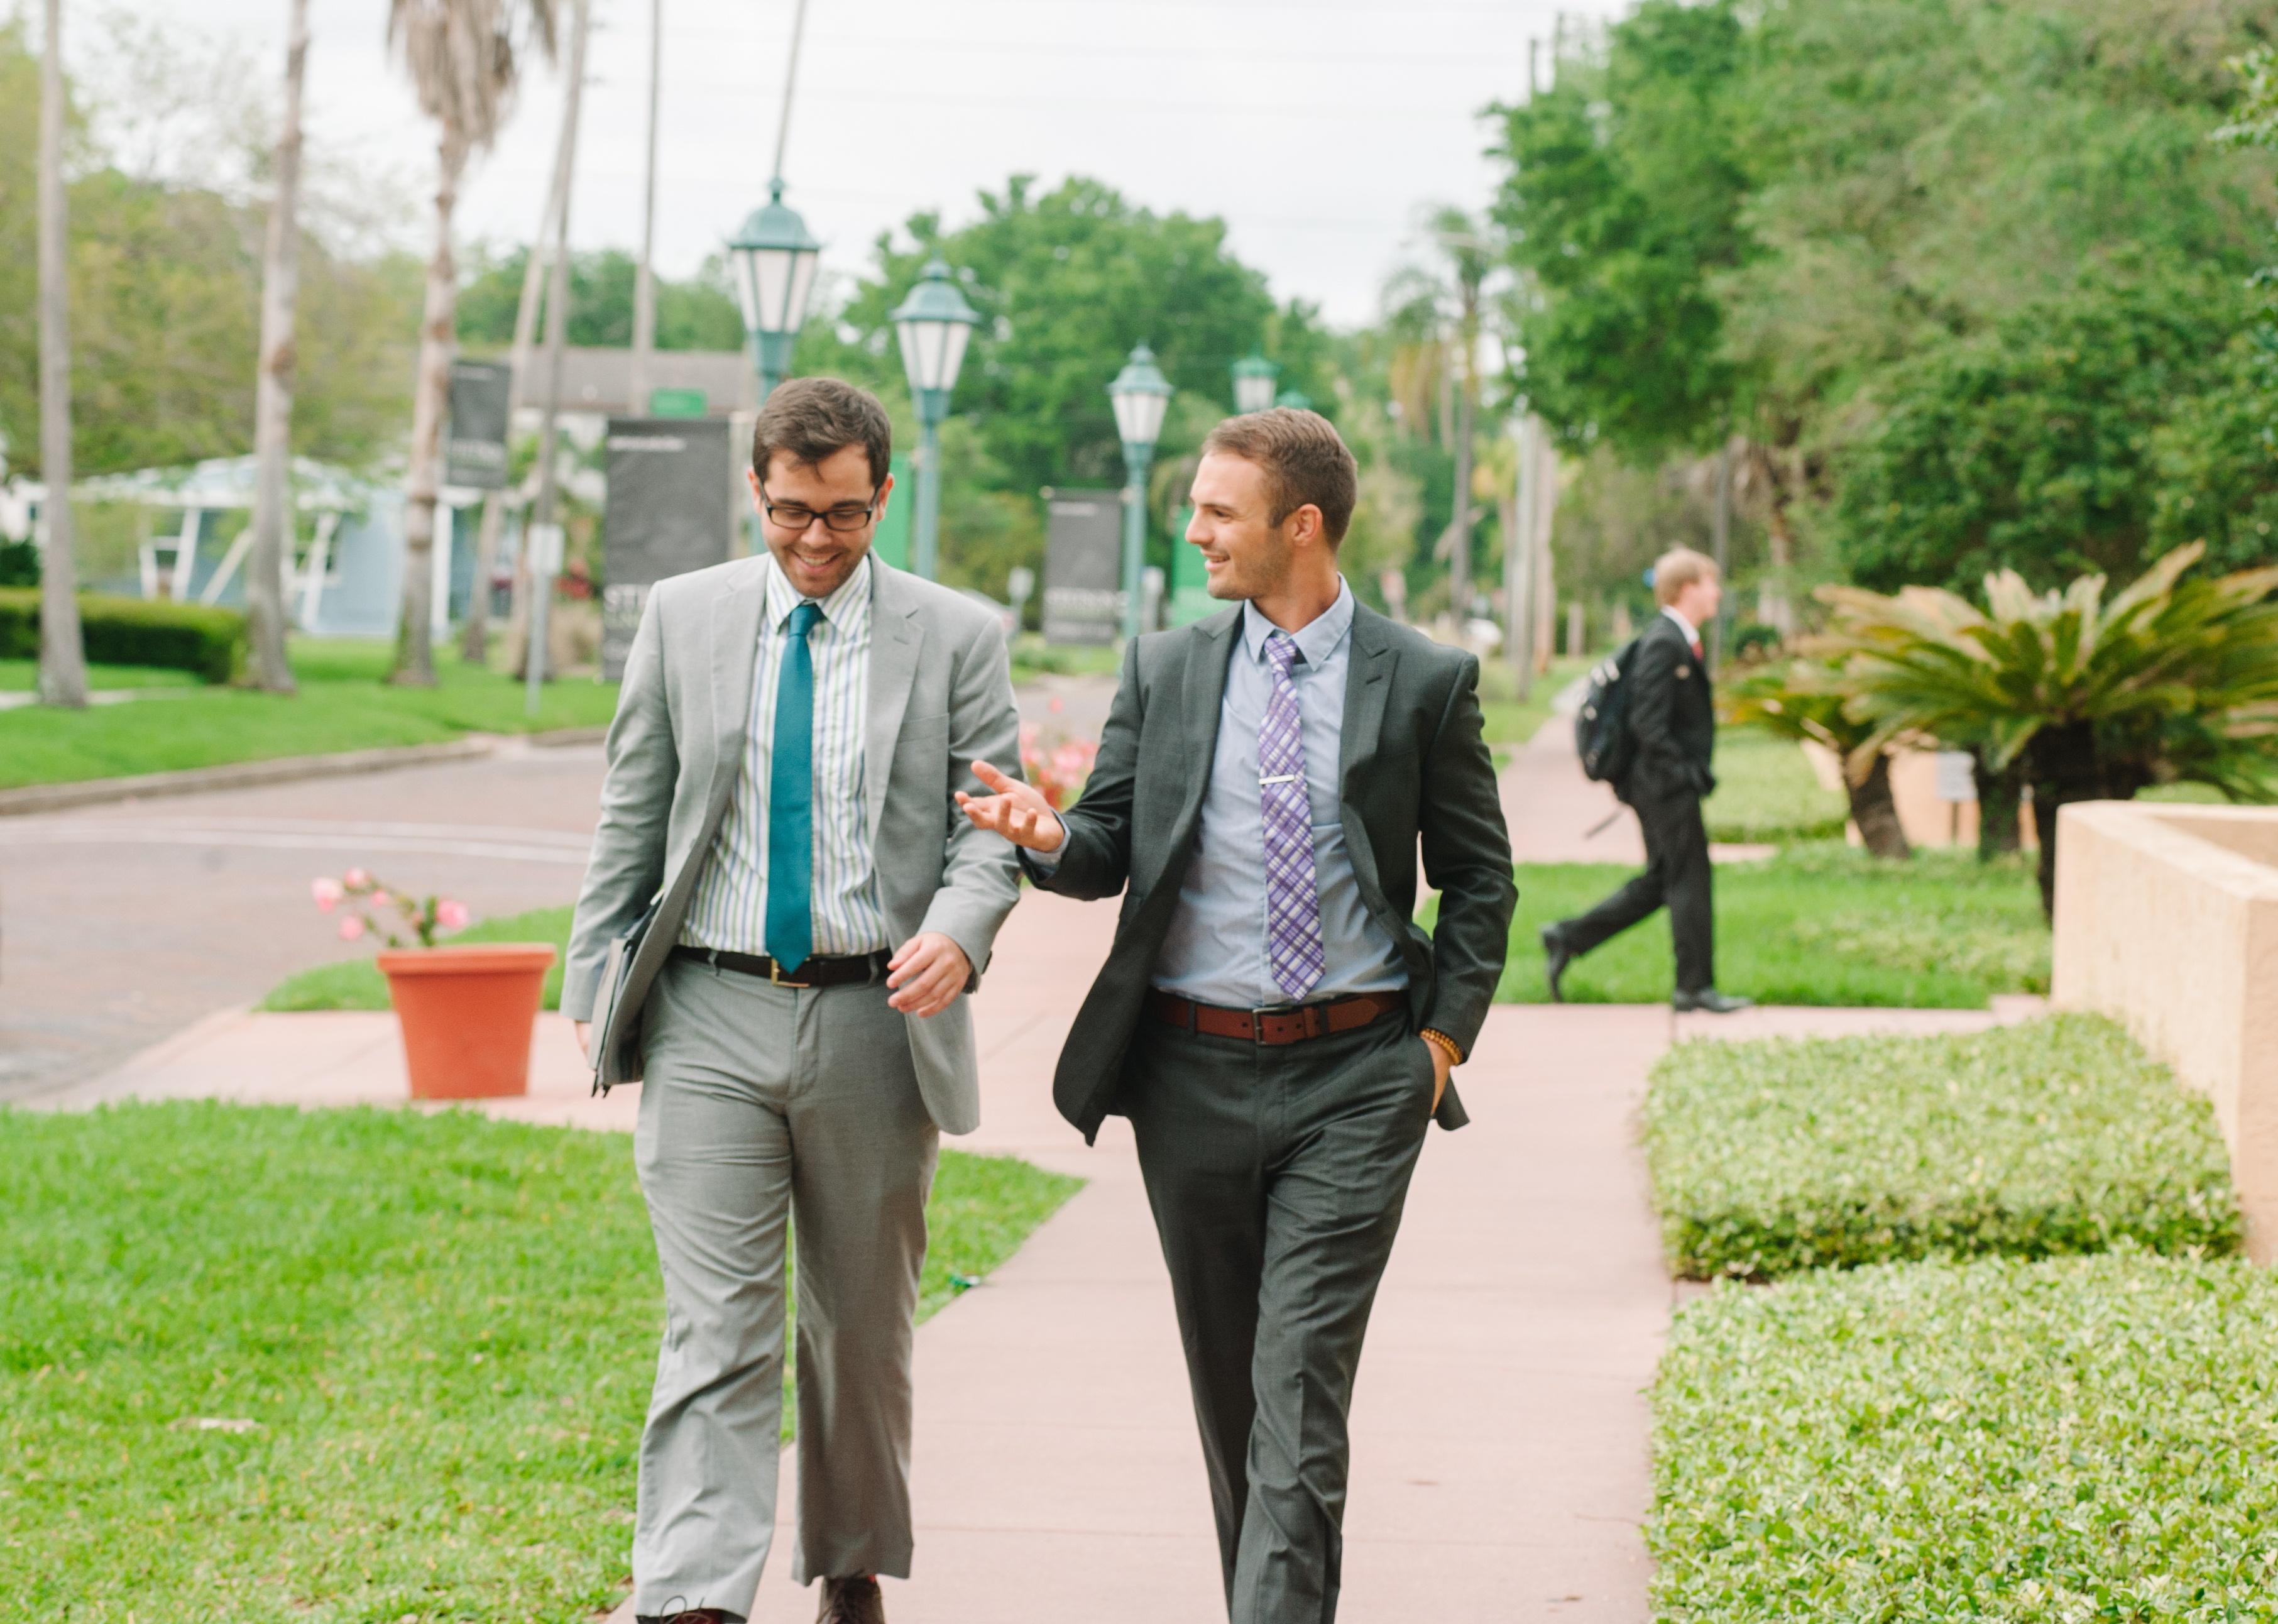 men_suits_street_laugh.jpg